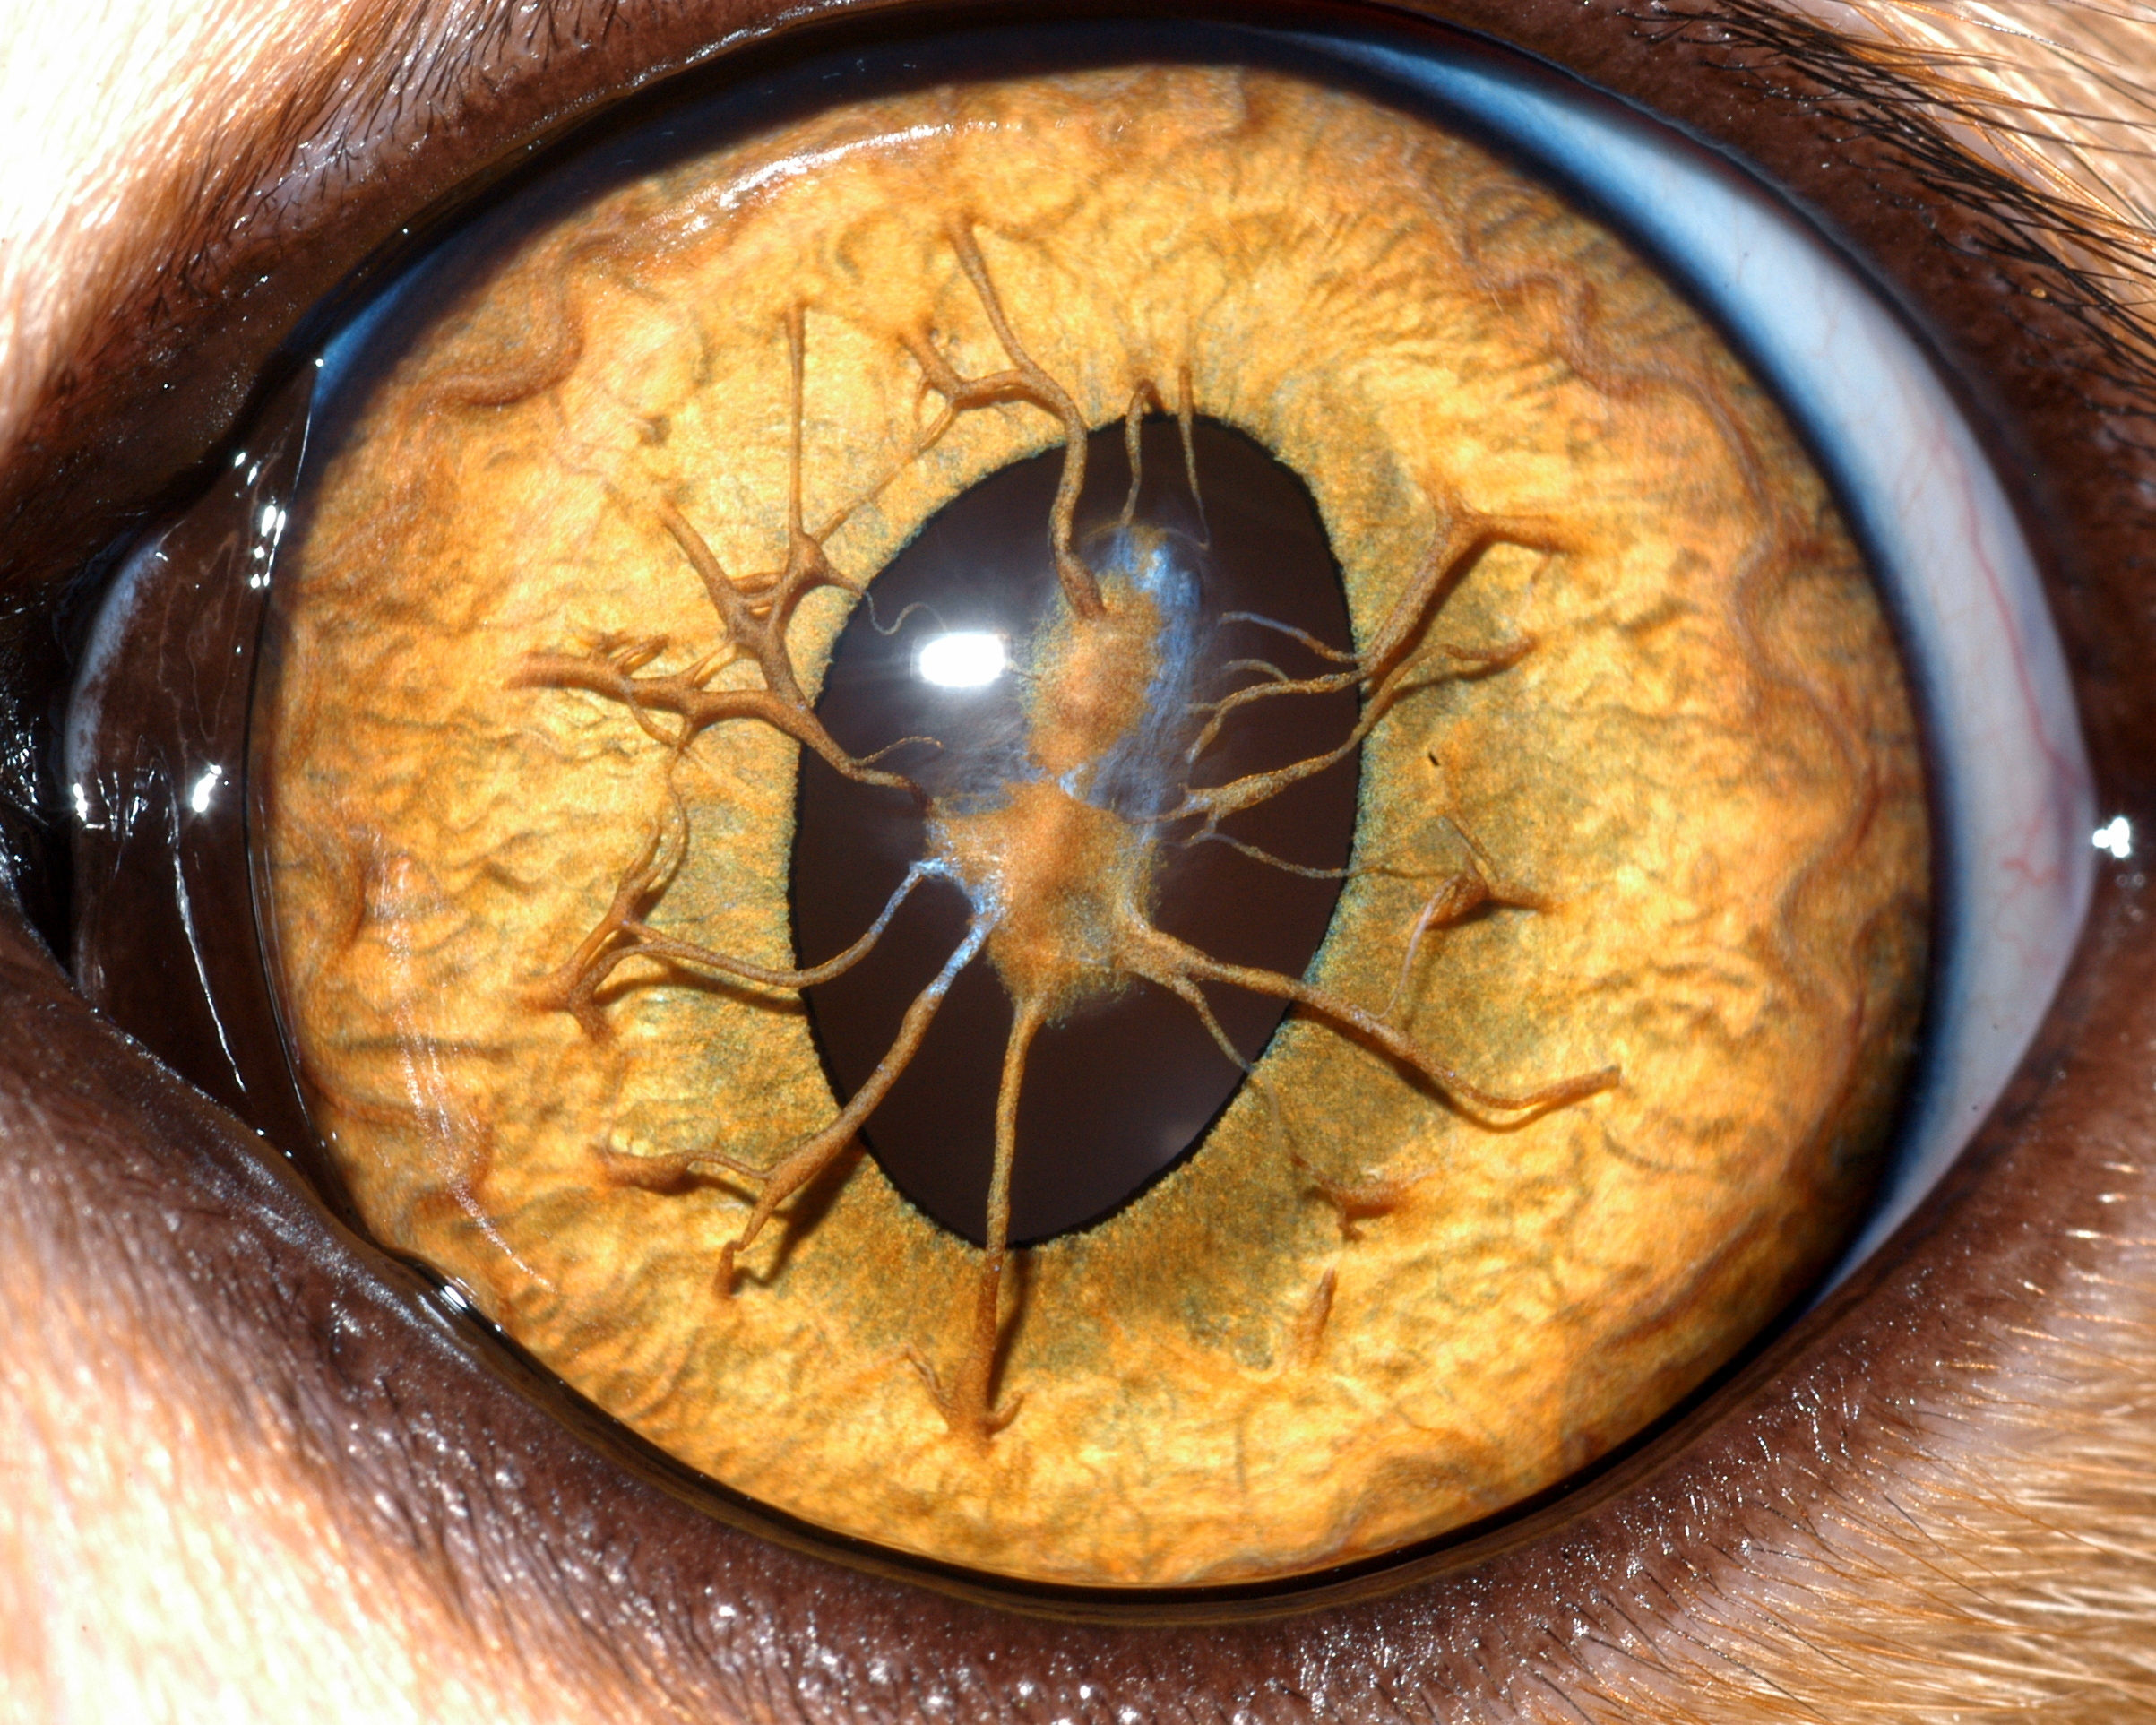 Dr. Sara Thomasy, UC Davis Comparative Ophthalmology Service